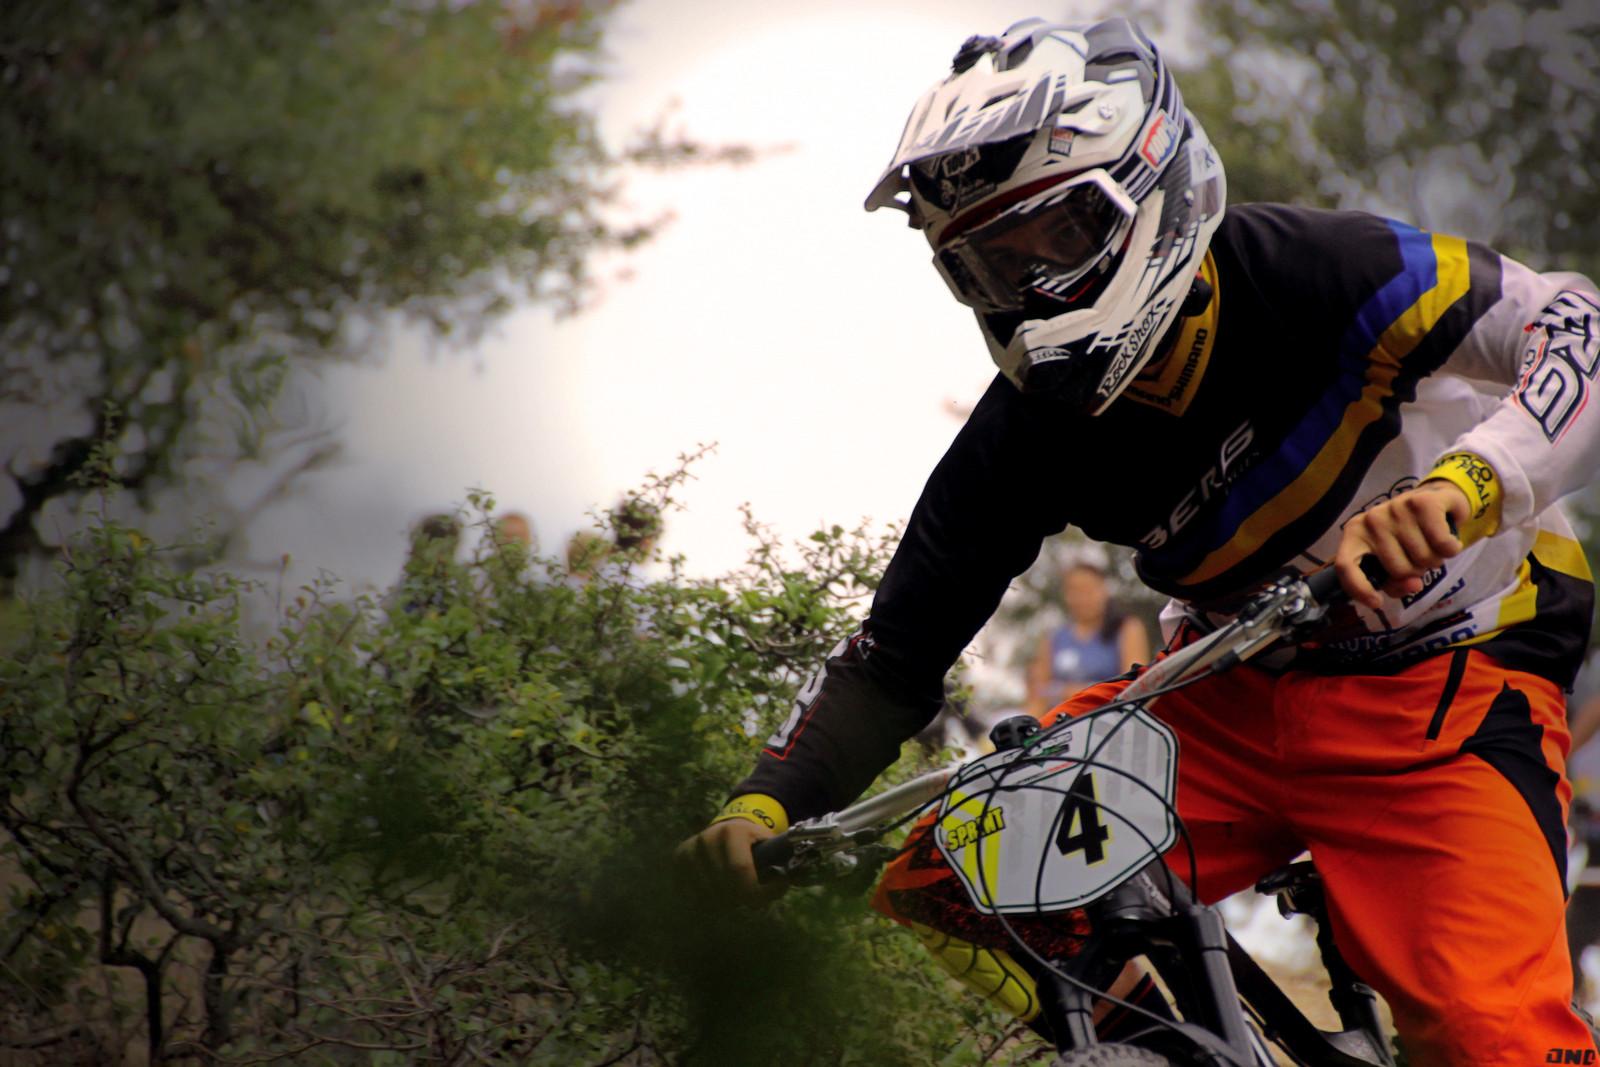 Super Enduro Tolfa 05 - Ruggero - Mountain Biking Pictures - Vital MTB